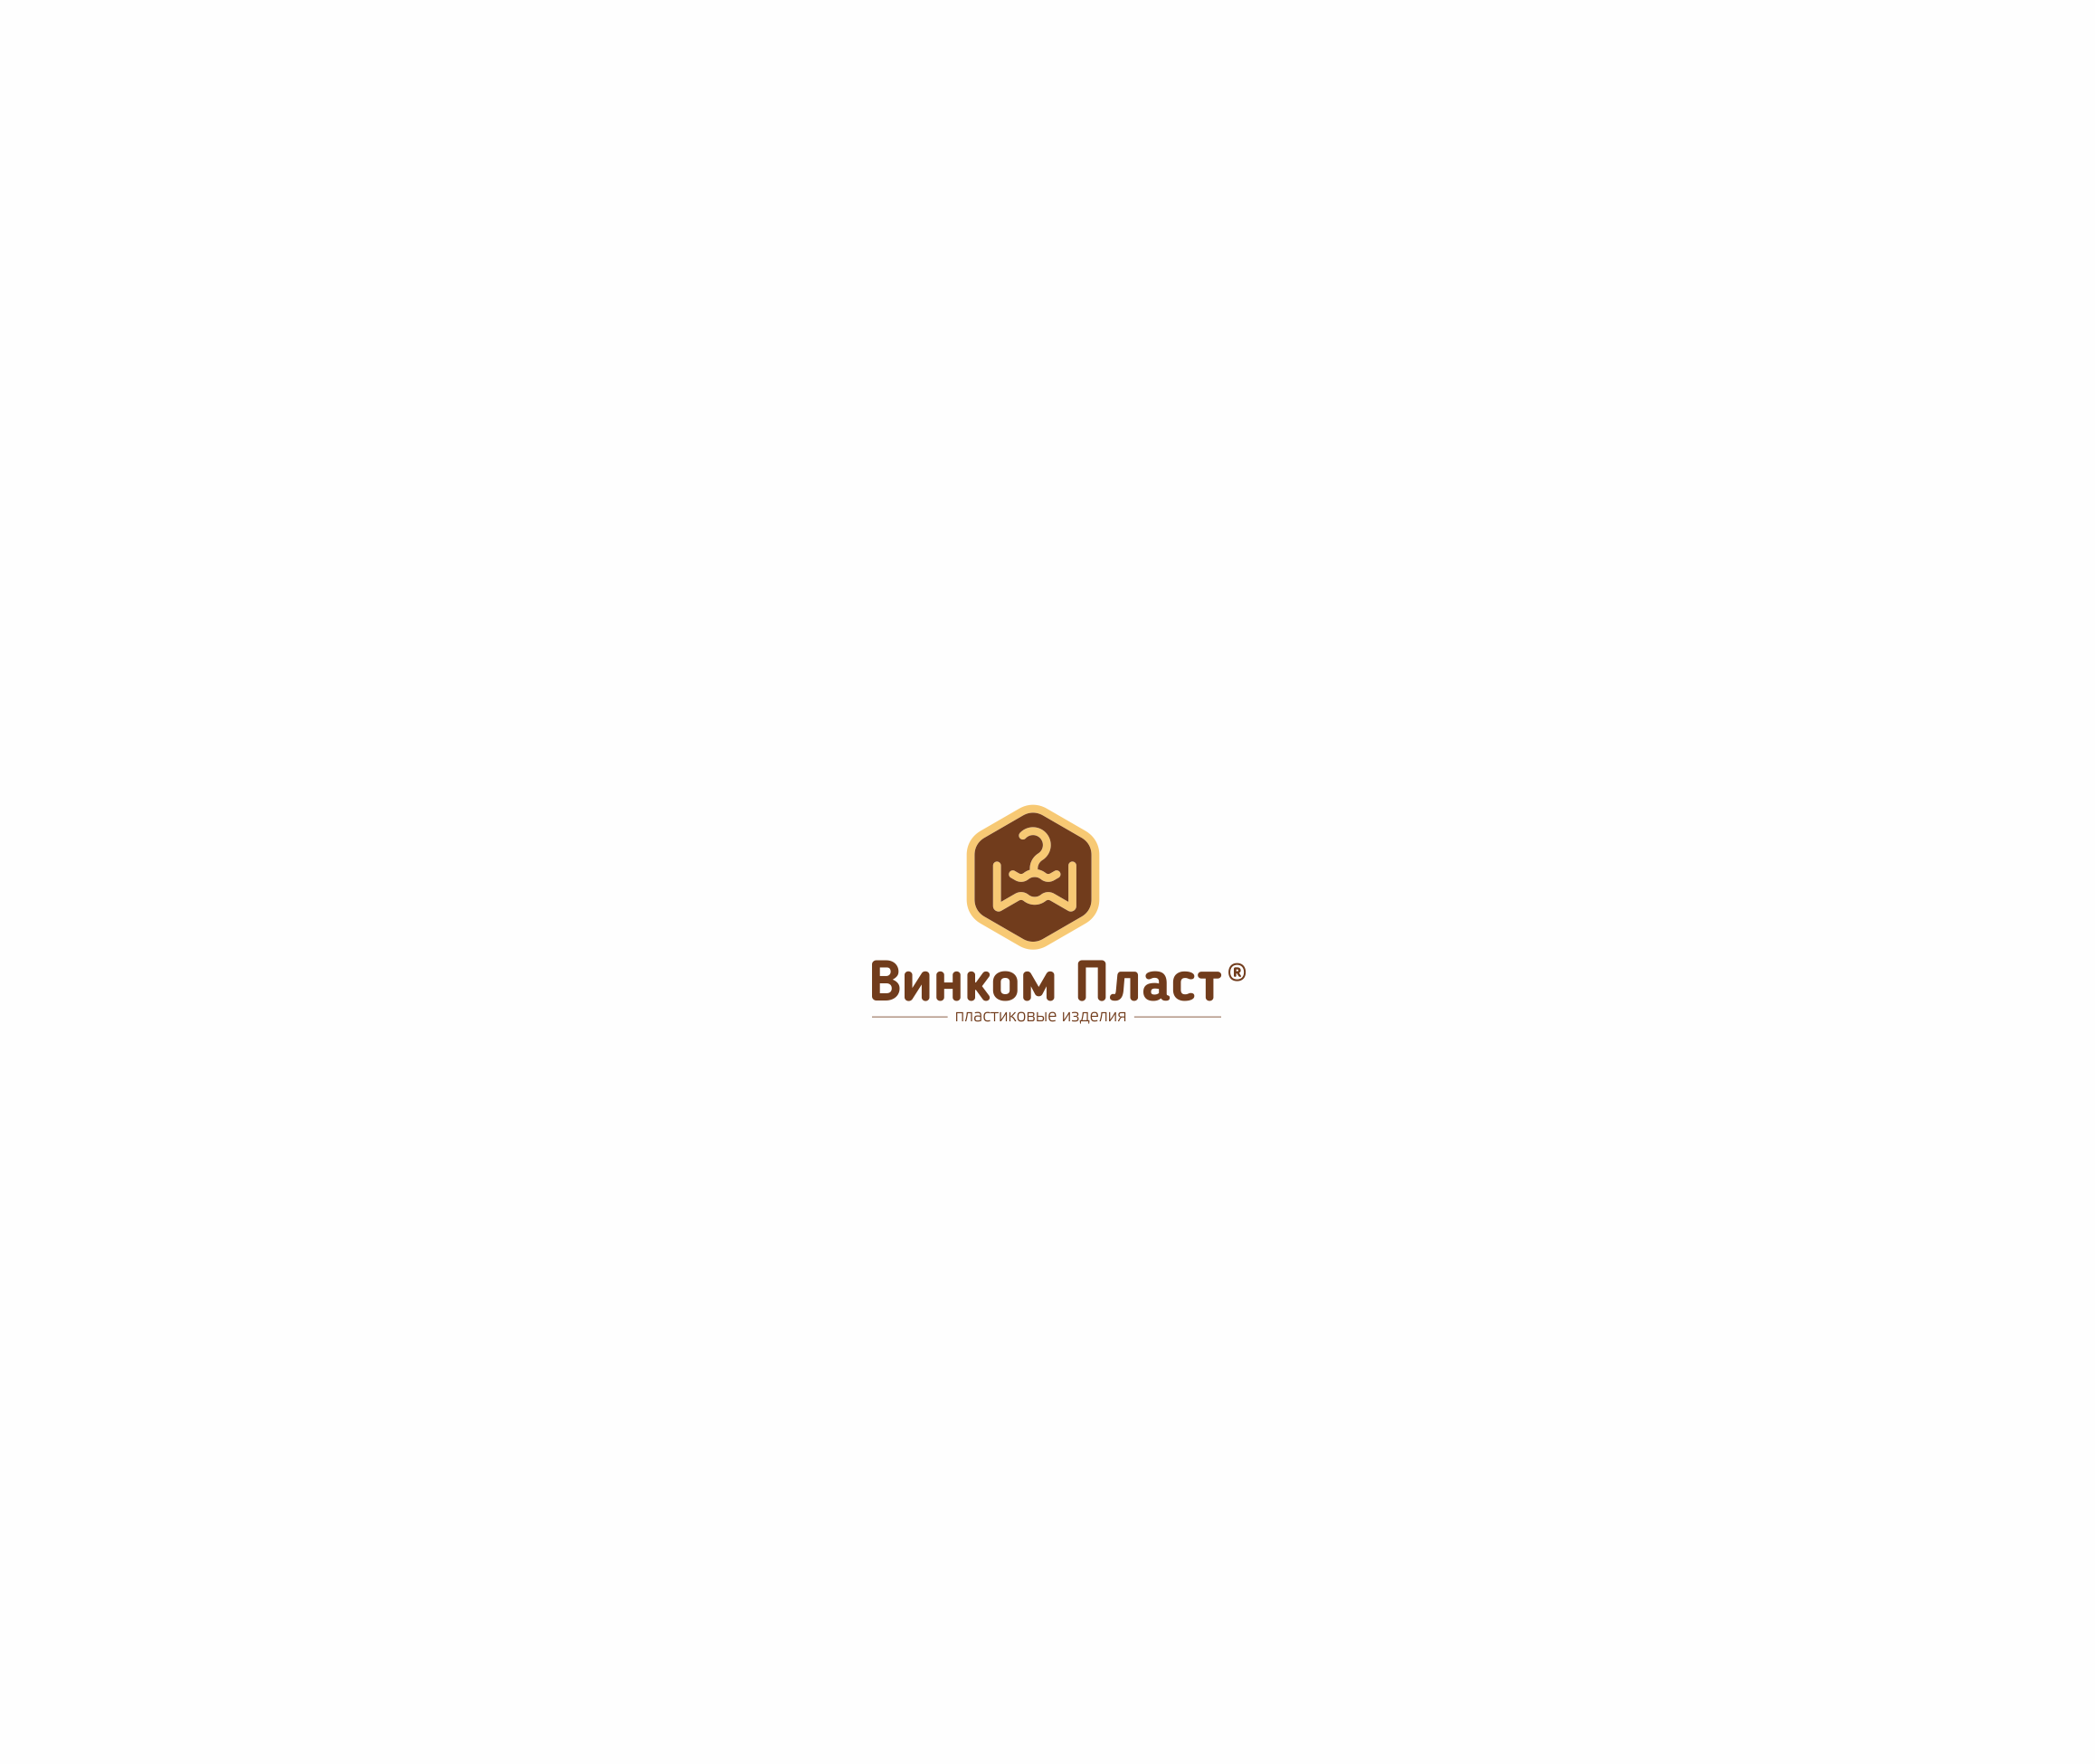 Логотип, фавикон и визитка для компании Винком Пласт  фото f_2875c39ff8943358.png